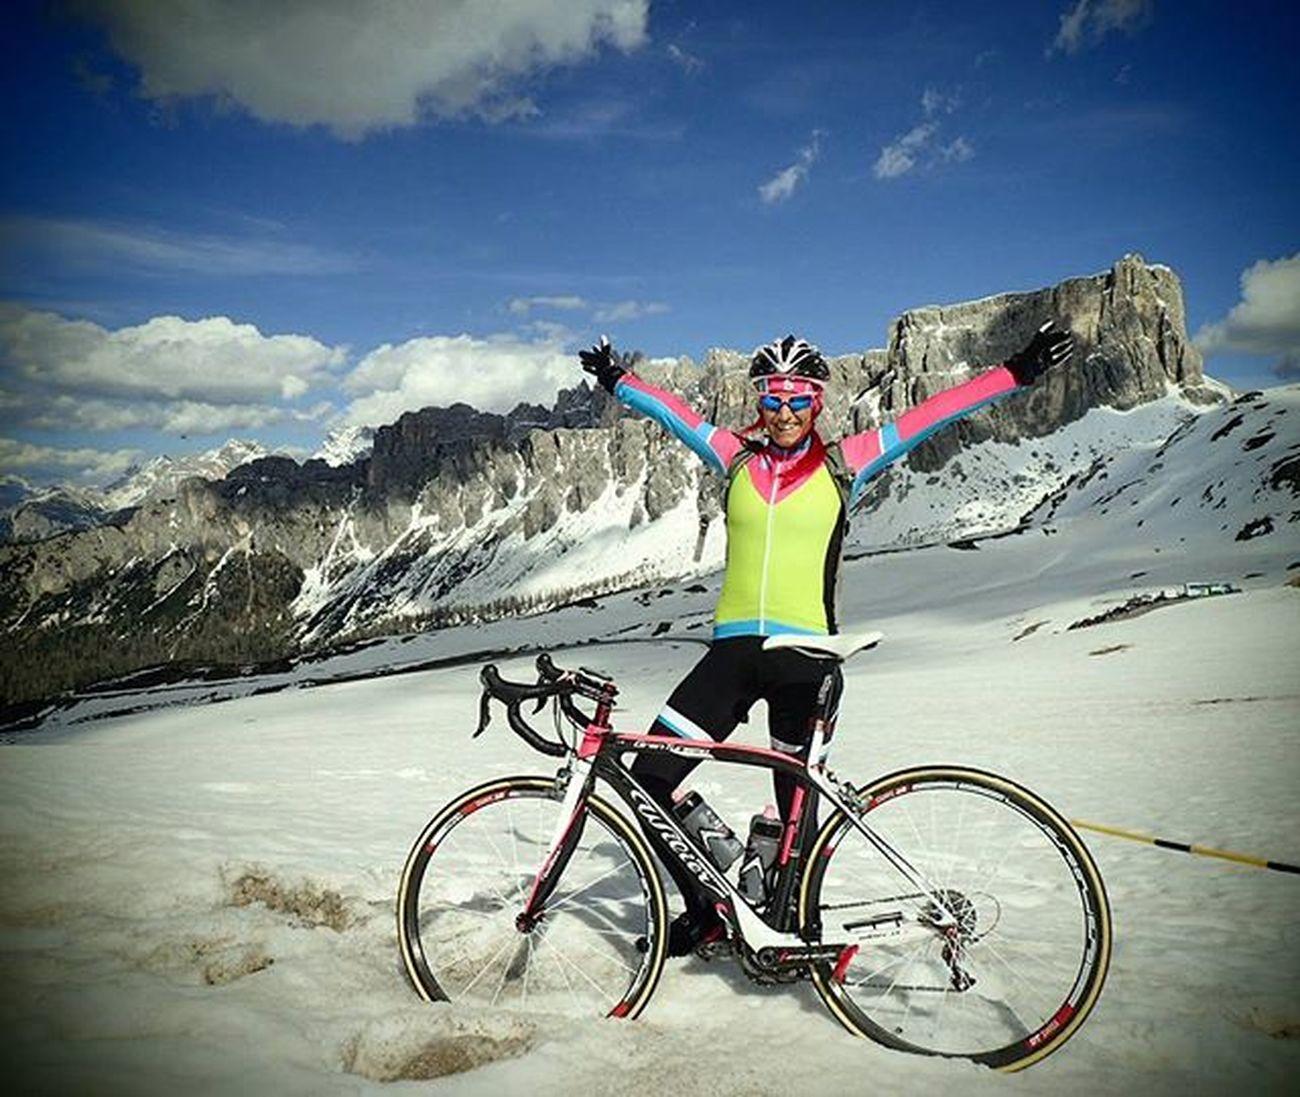 😍😍😍I am iN heaVeN😍😍😍 Passogiau Fightforpink Giro Giroditalia Giroditalia2016 Cyclingexplorers Ciclismo Roadcycling Sportaddict Wilier My_dolomiti LOVES_BIKES Ridelikeagirl Trytokeepup Bikegirl Badassisbeautiful Ridewithaview Fromwhereiride Ig_trentinoaltoadige Igerscycling Nevergiveup Loves_dolomiti Loves_mountains Stravacycling Stravaphoto ig_neverstopexploring lifeisgood 📸@mihamalus comeonsummer collesantalucia dolomitescycling